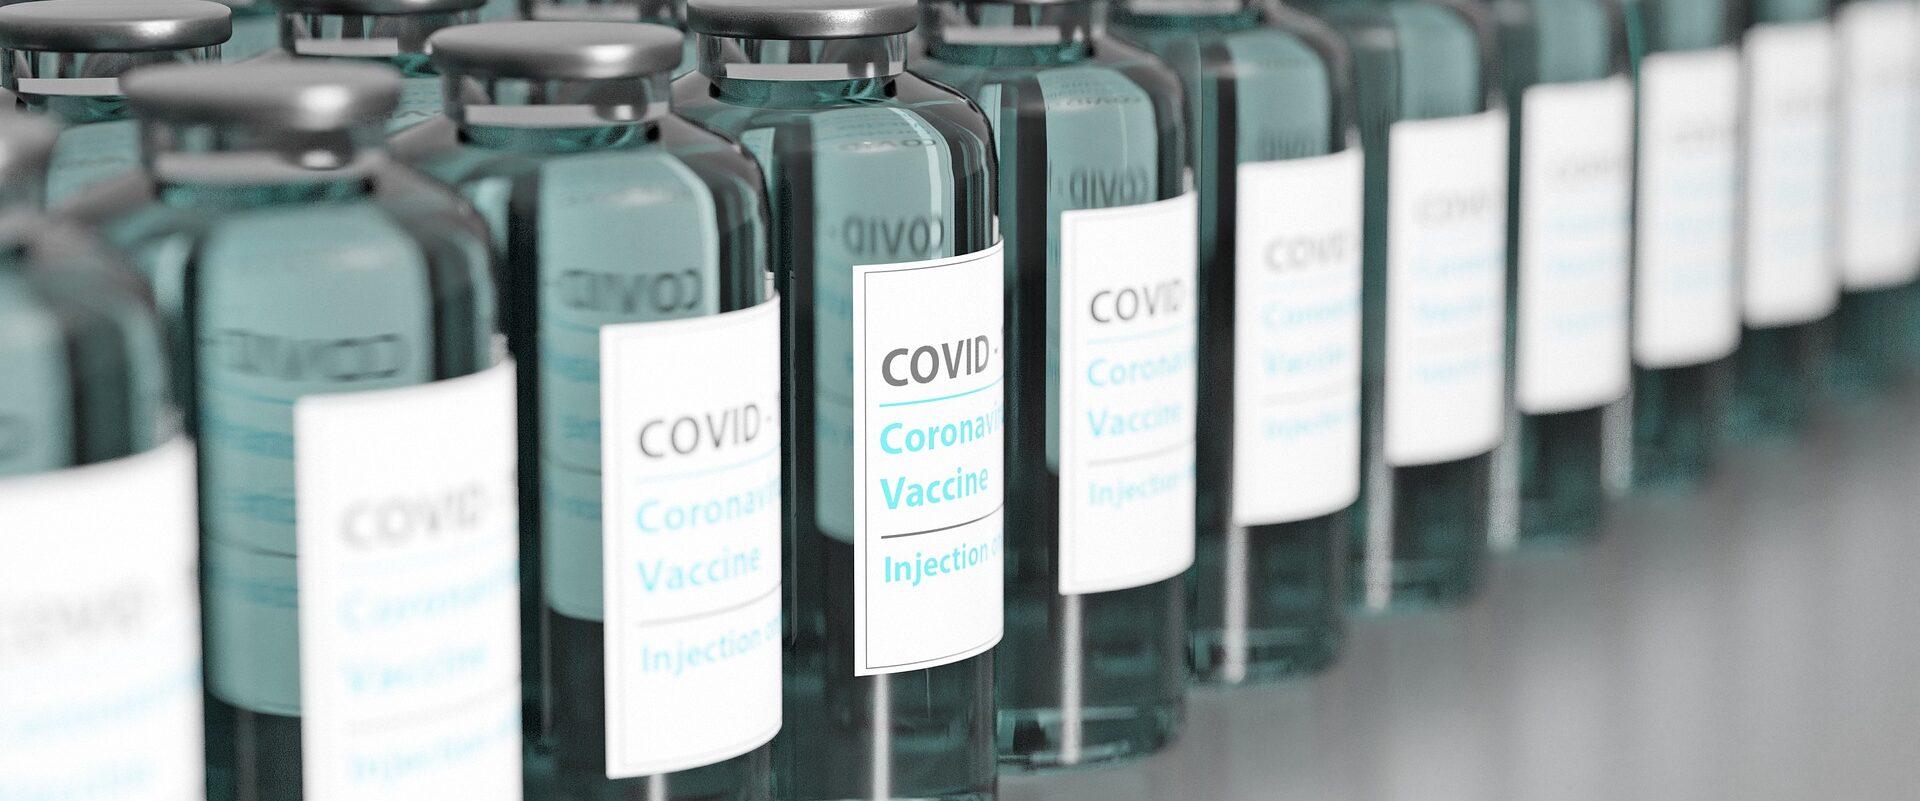 Covid-19 Vaccine bottles